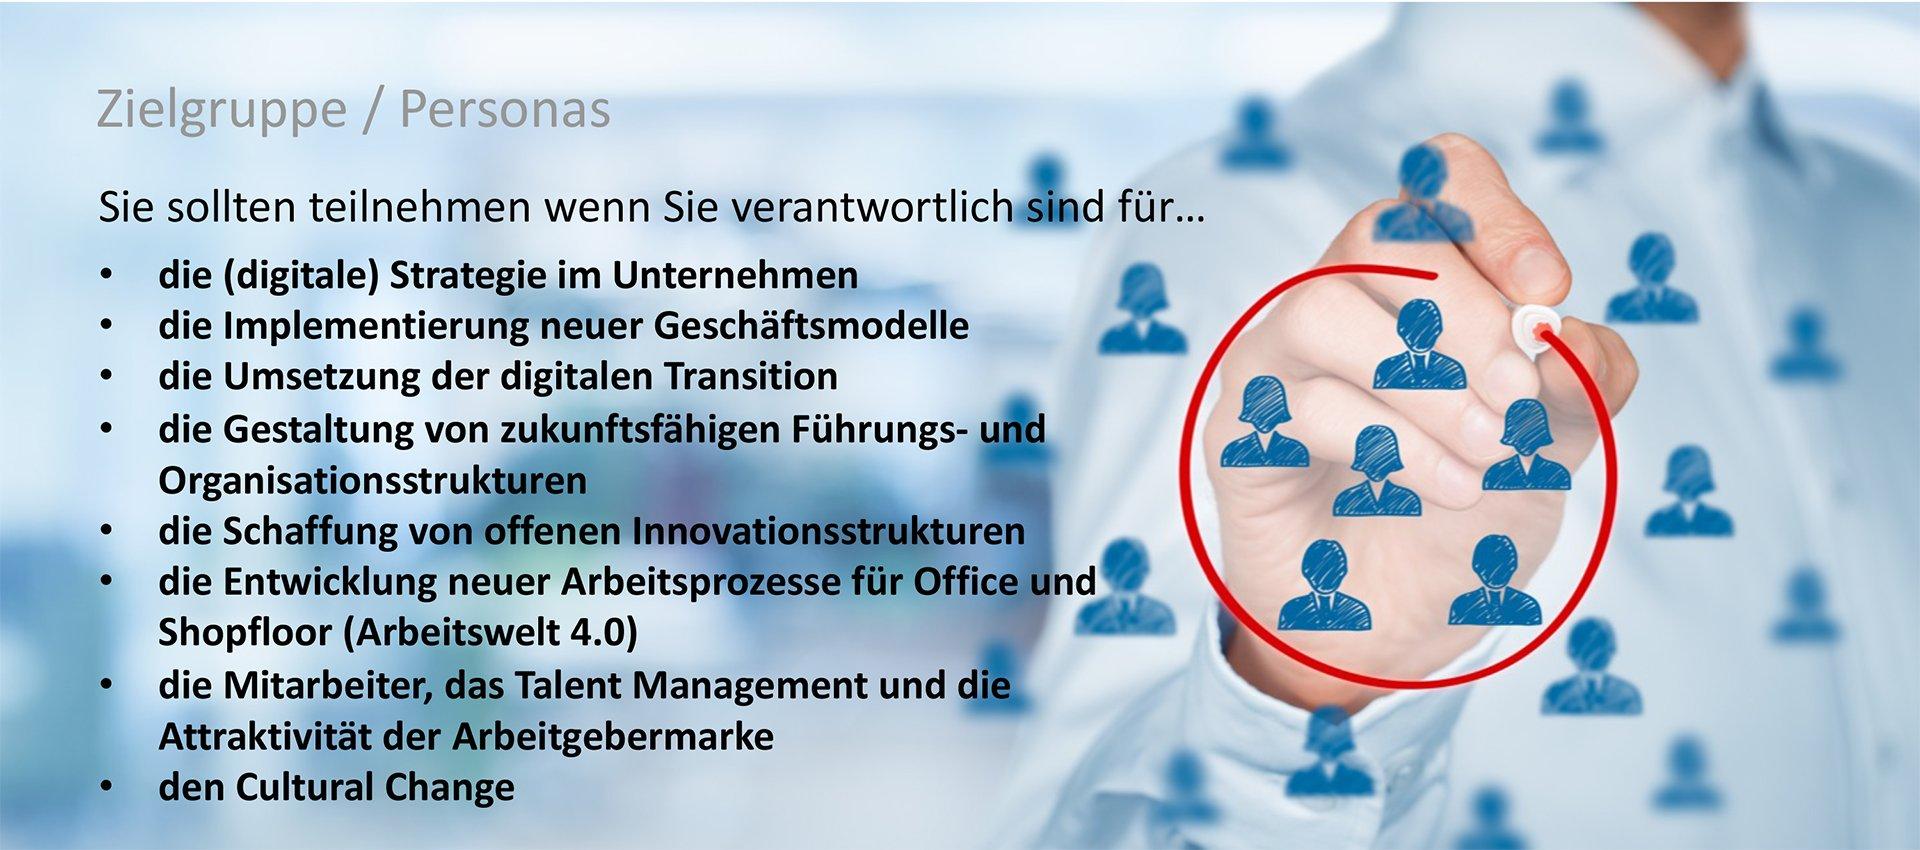 DIP3_Reinventing-Organizations